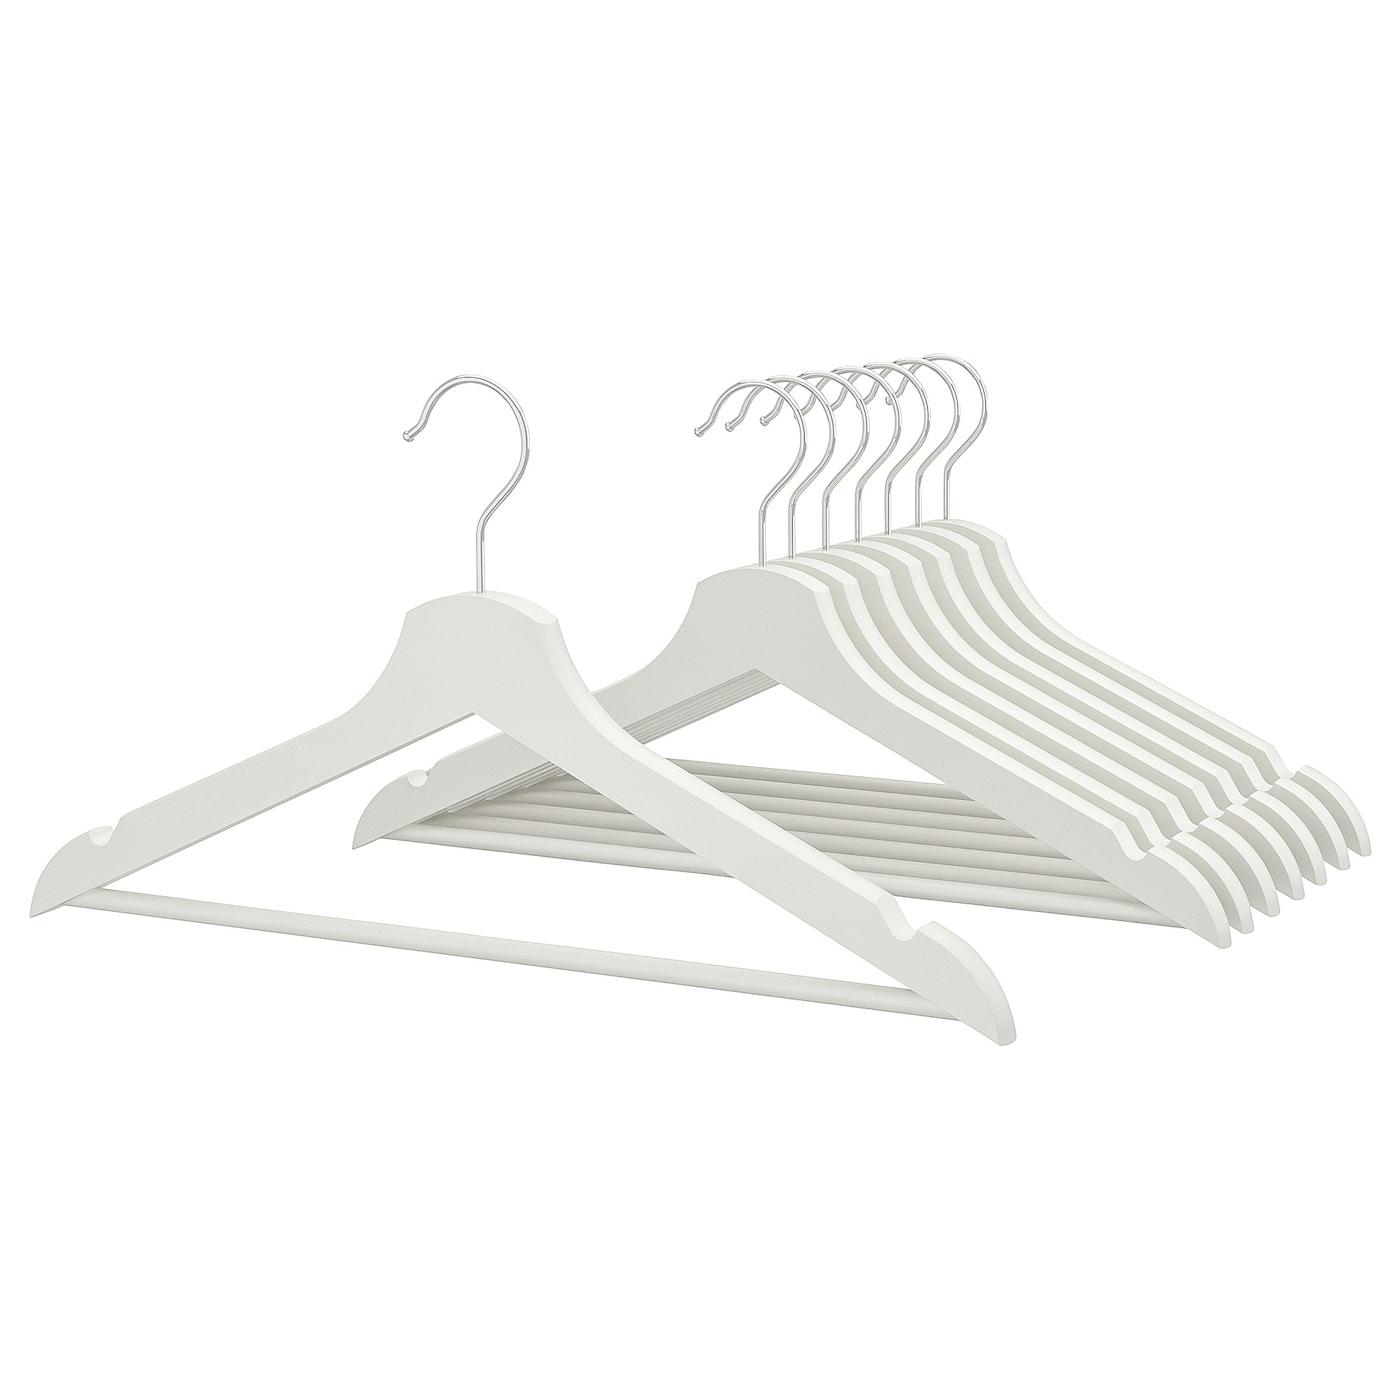 White Bumerang IKEA Hanger Wood Clothes Coat 8 Pack